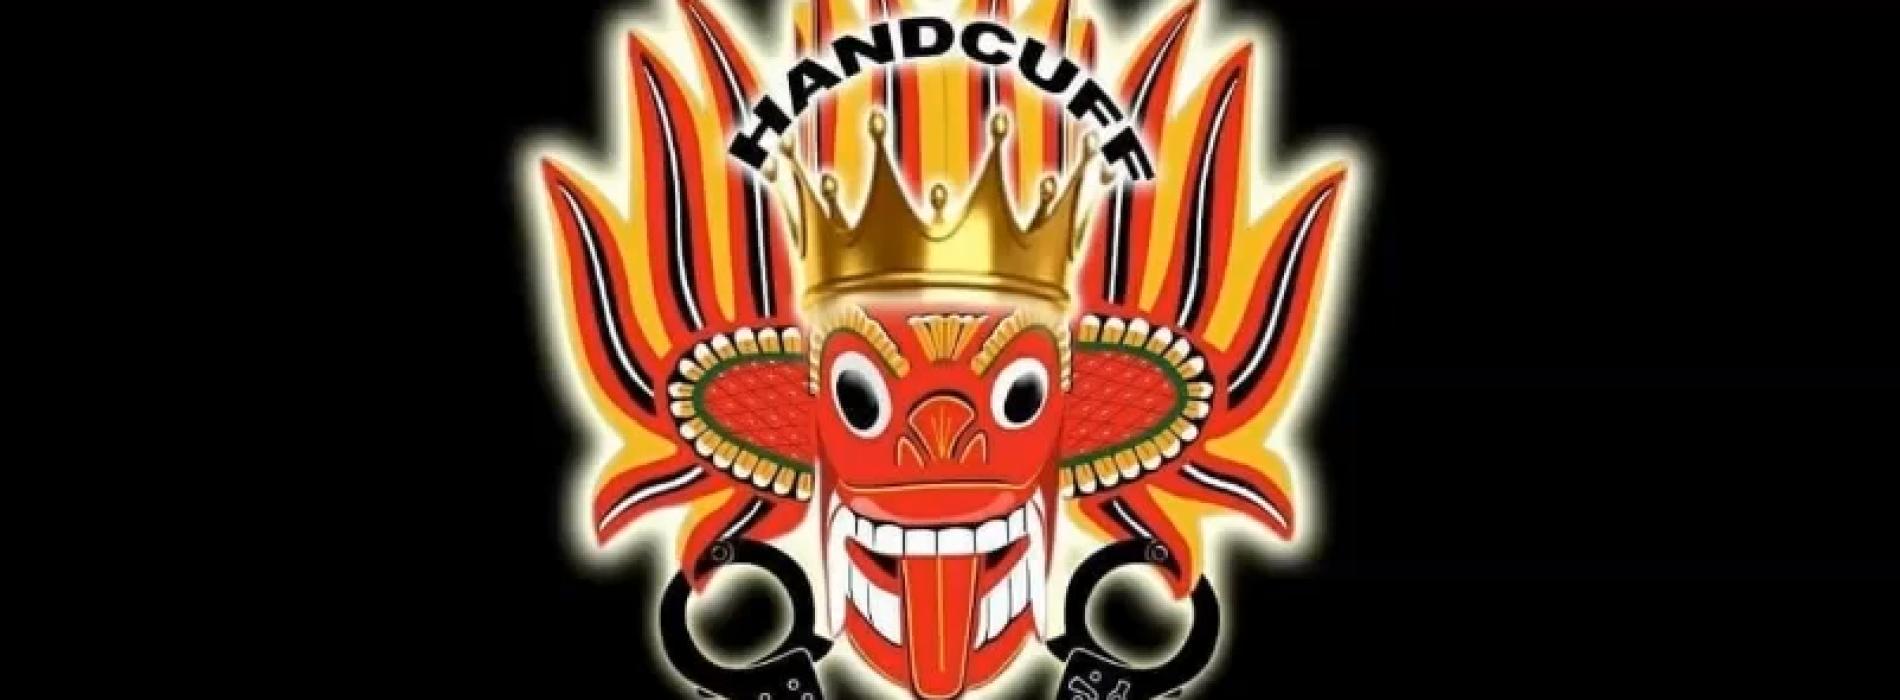 Handcuff – Api Thamai Raganne මාංචු (LWA DISS)